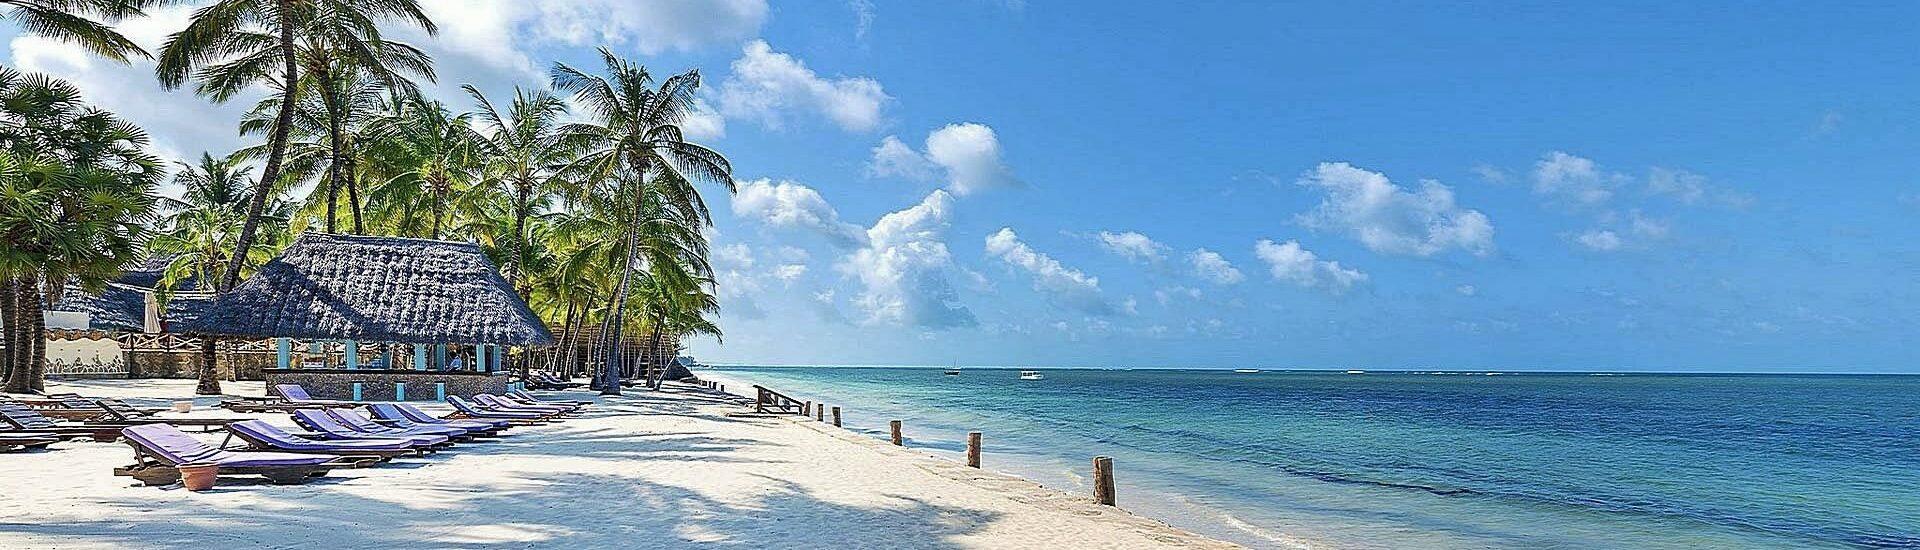 Keňské pláže